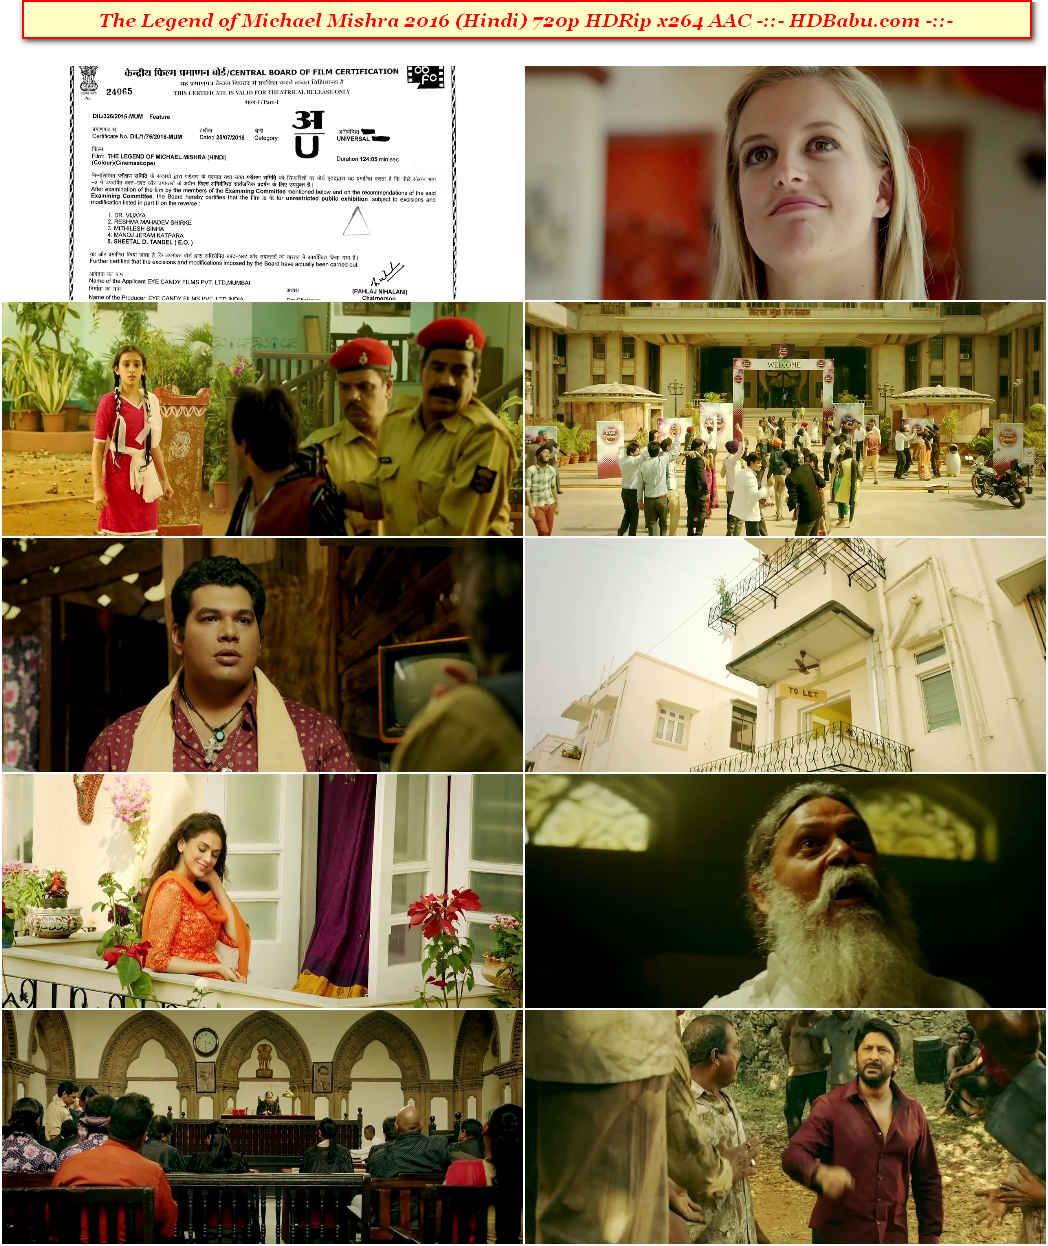 The Legend of Michael Mishra Full Movie Download